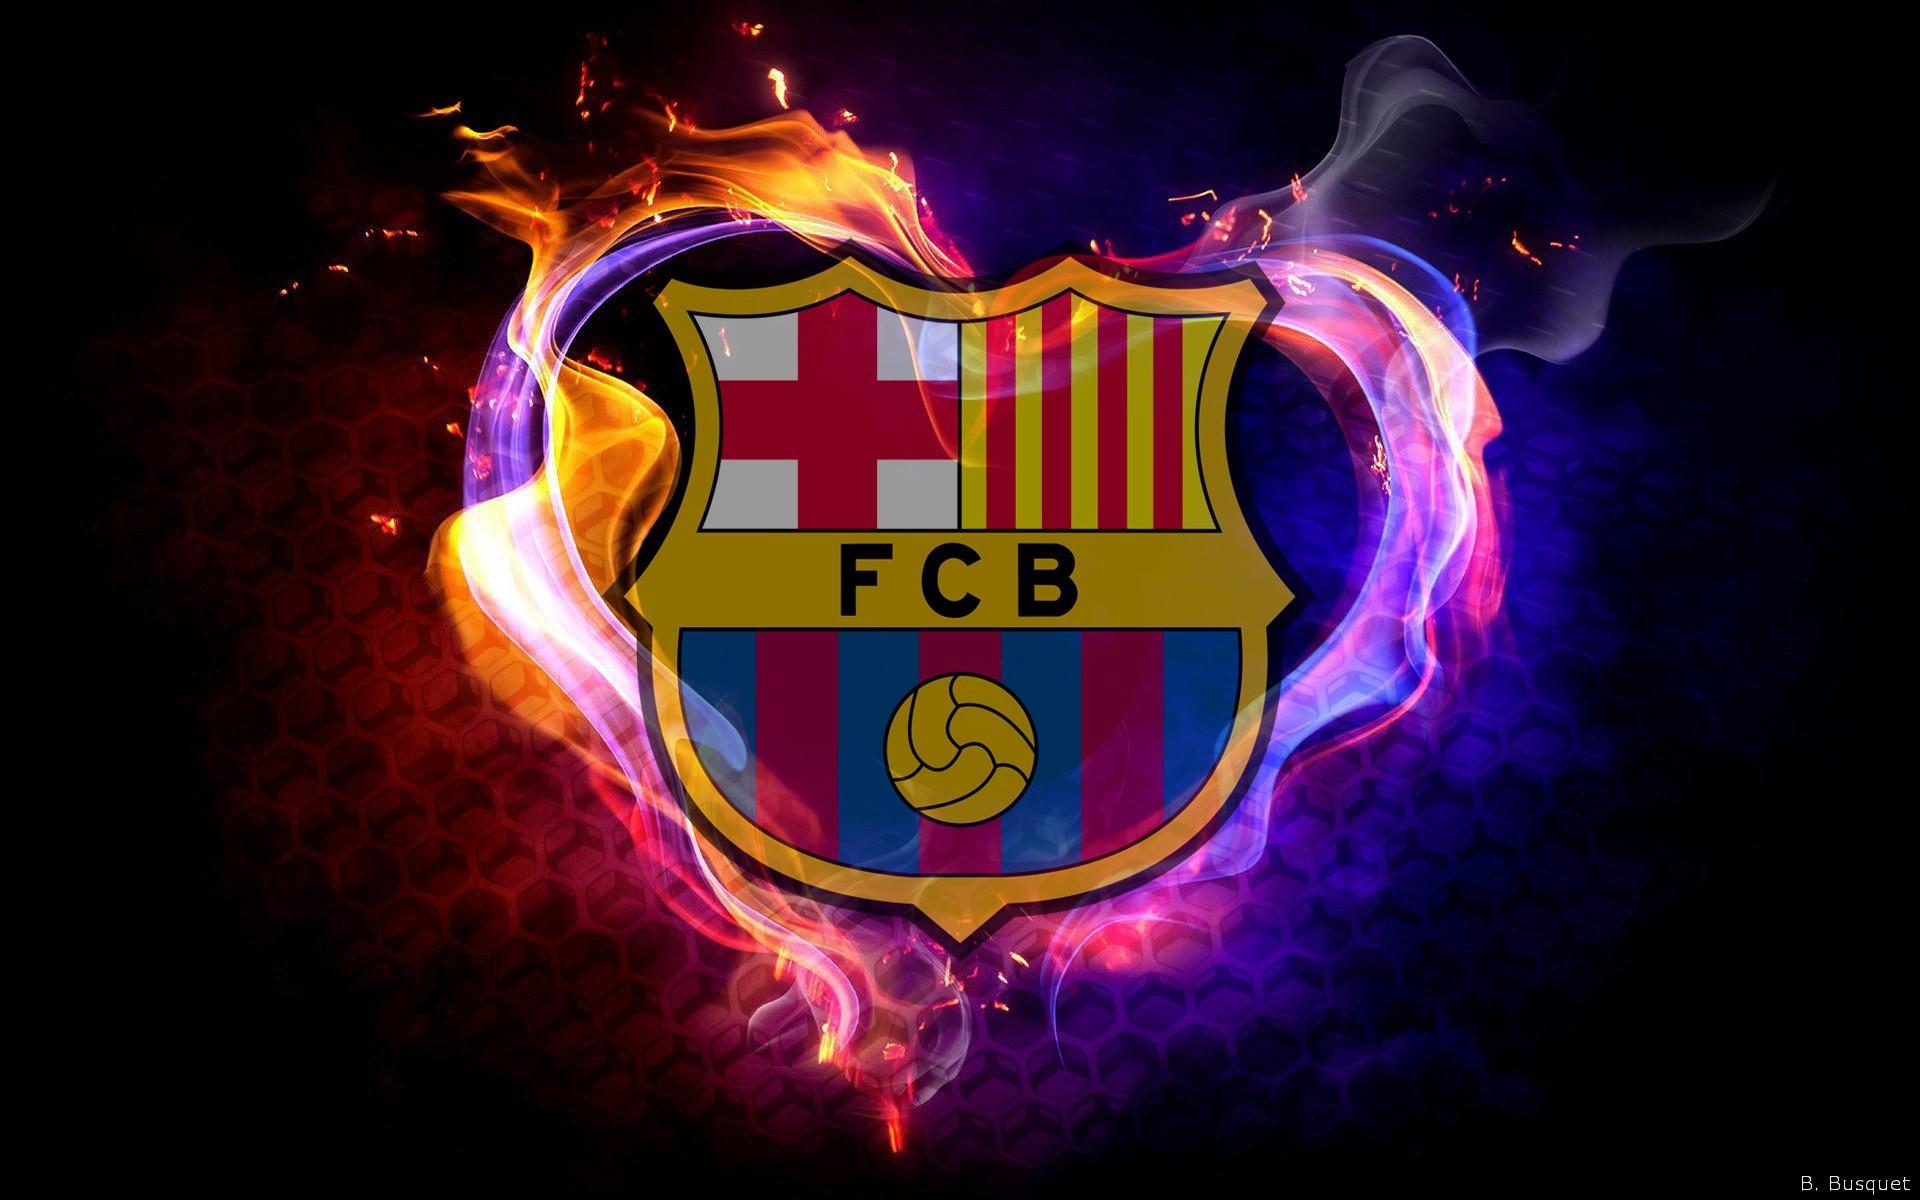 1080x1920 Soccer IPhone 6 HD Wallpaper IPod